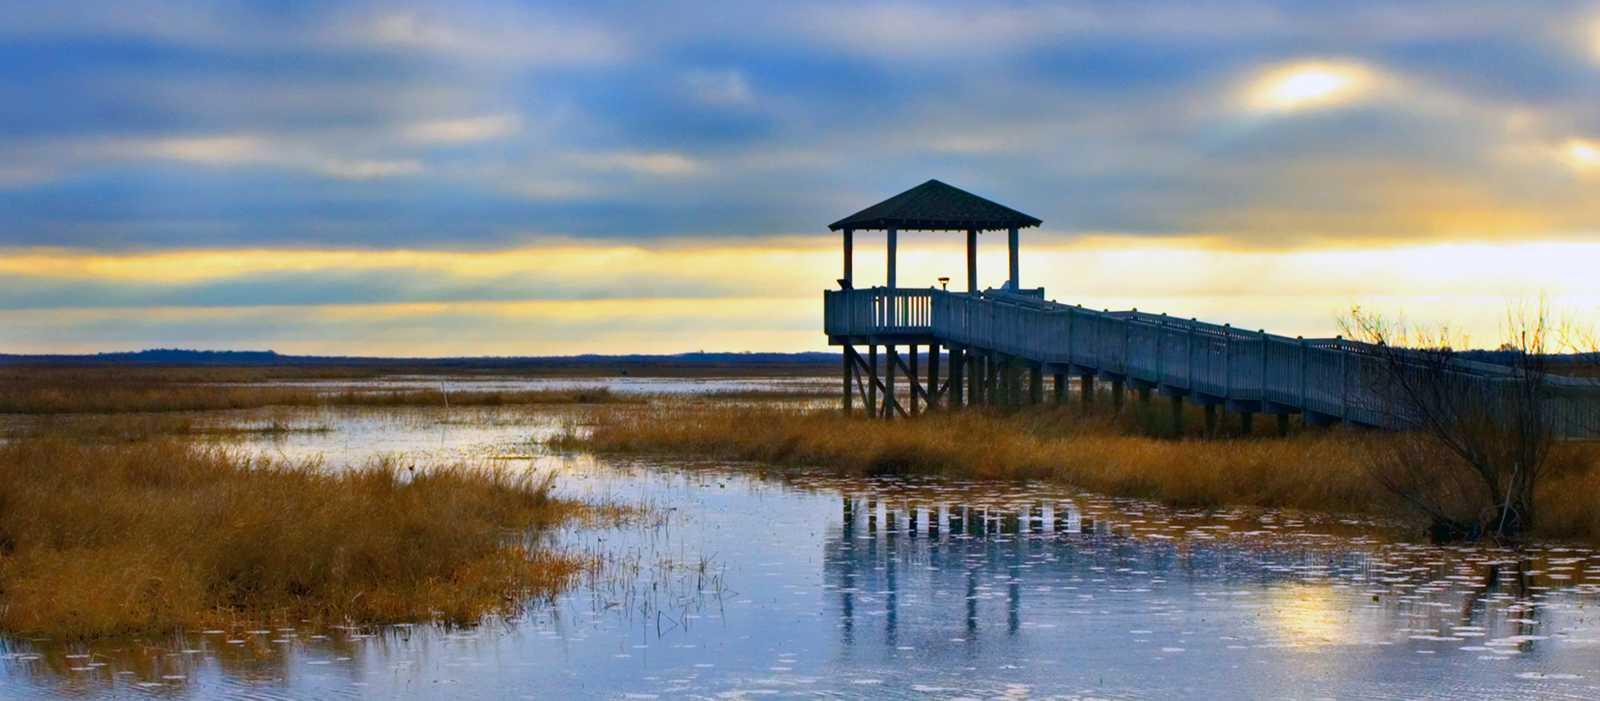 Lacassine National Wildlife Refuge in Louisiana